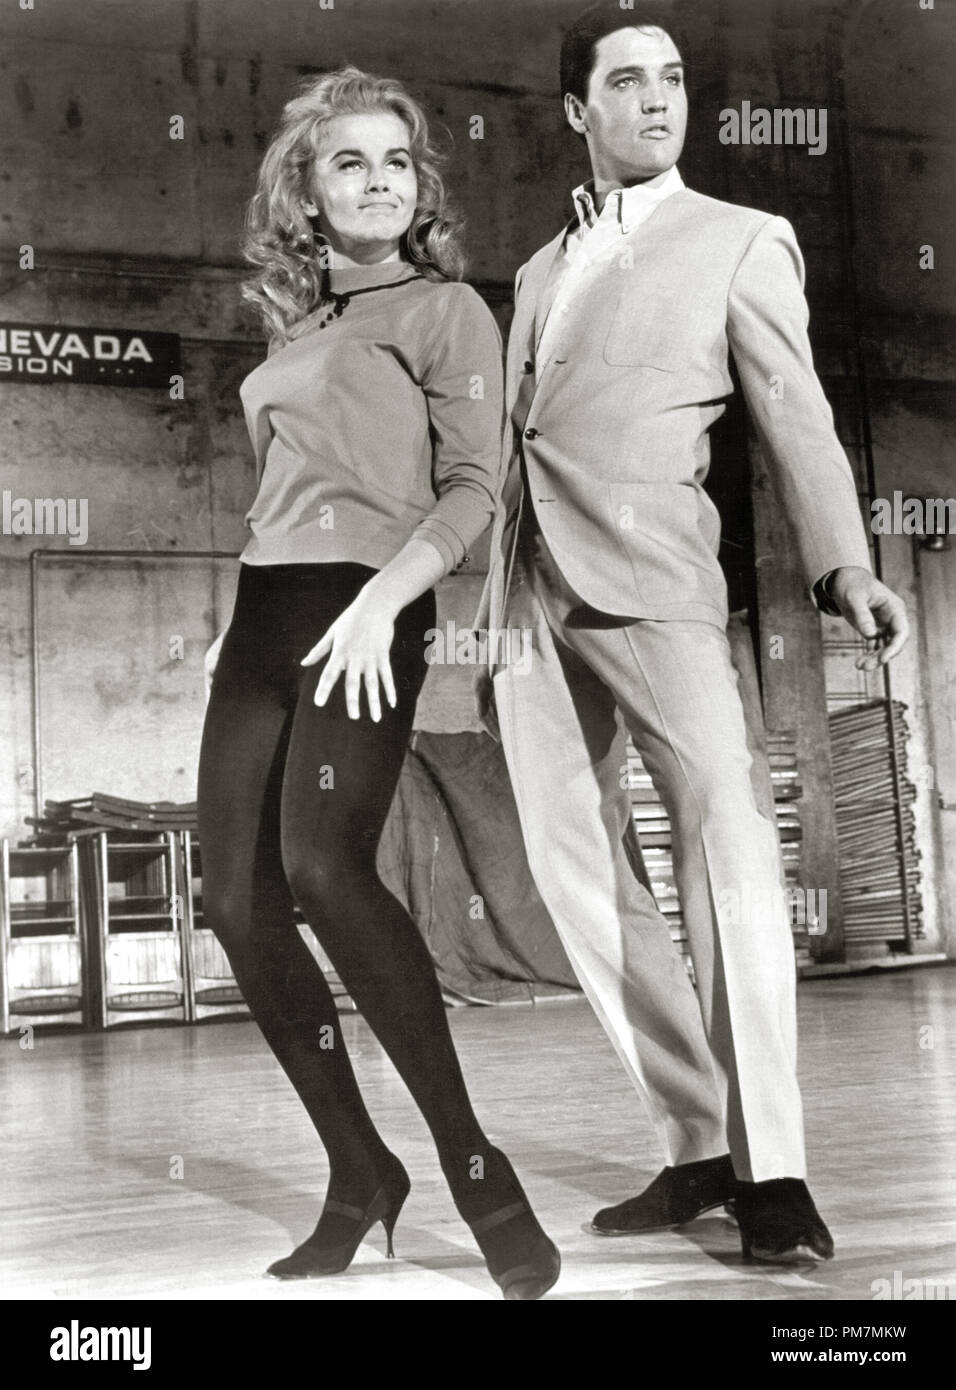 Ann-Margret and Elvis Presley, 'Viva Las Vegas' 1964 File Reference # 31202_389THA - Stock Image